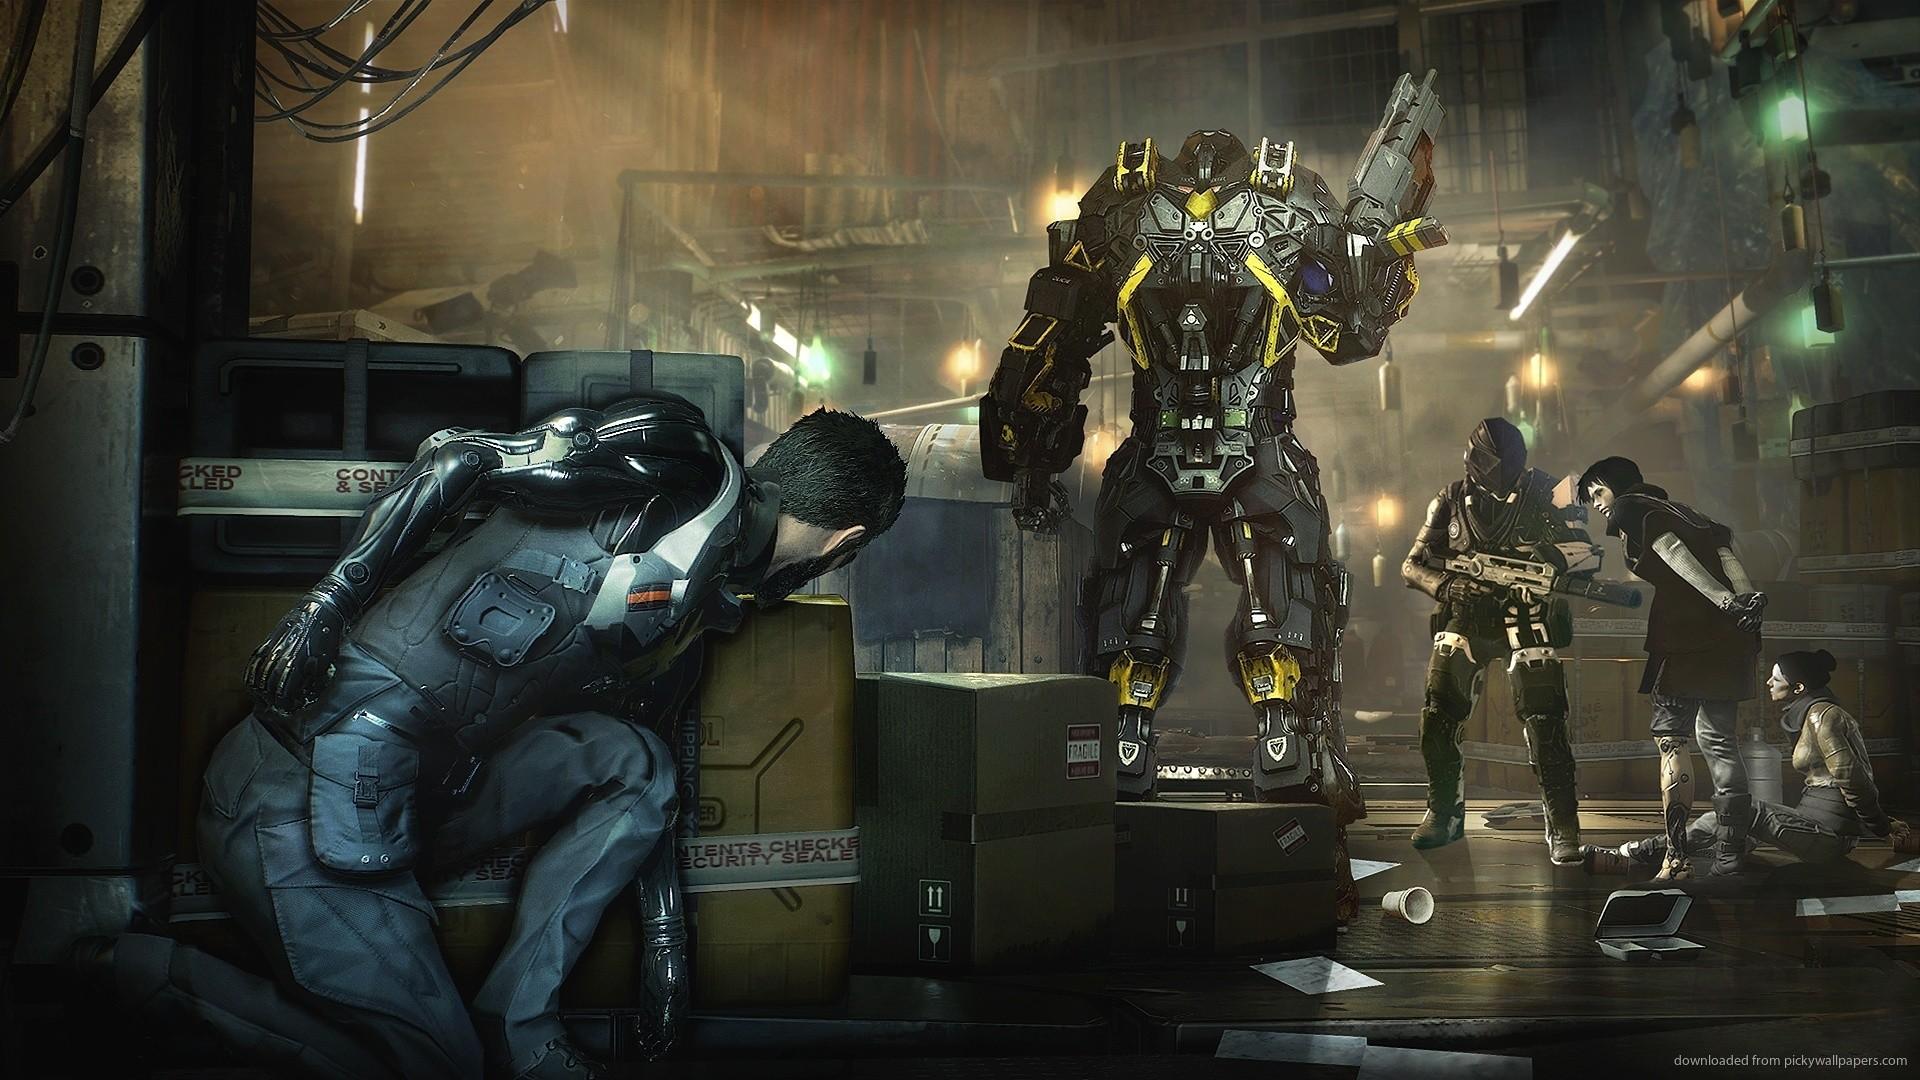 Deus Ex Mankind Divided Video Game Desktop Wallpaper picture